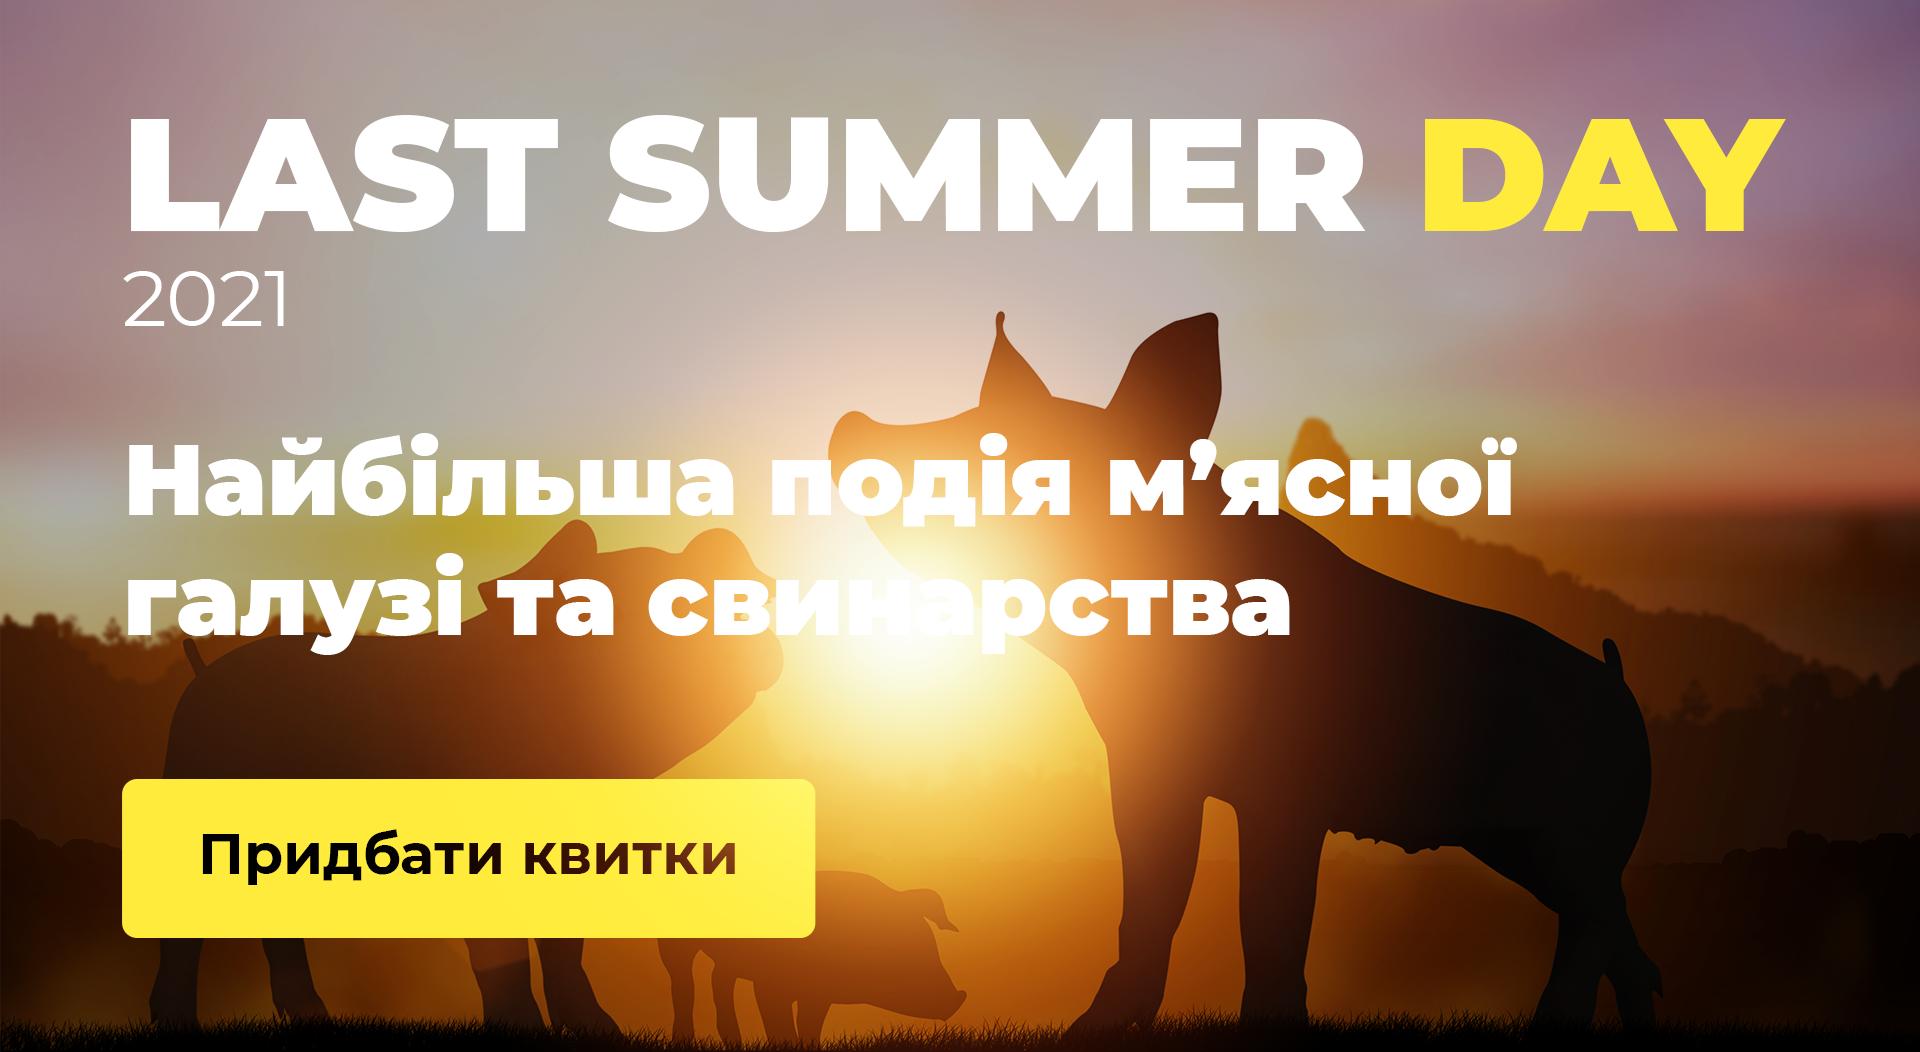 last summer day 2021